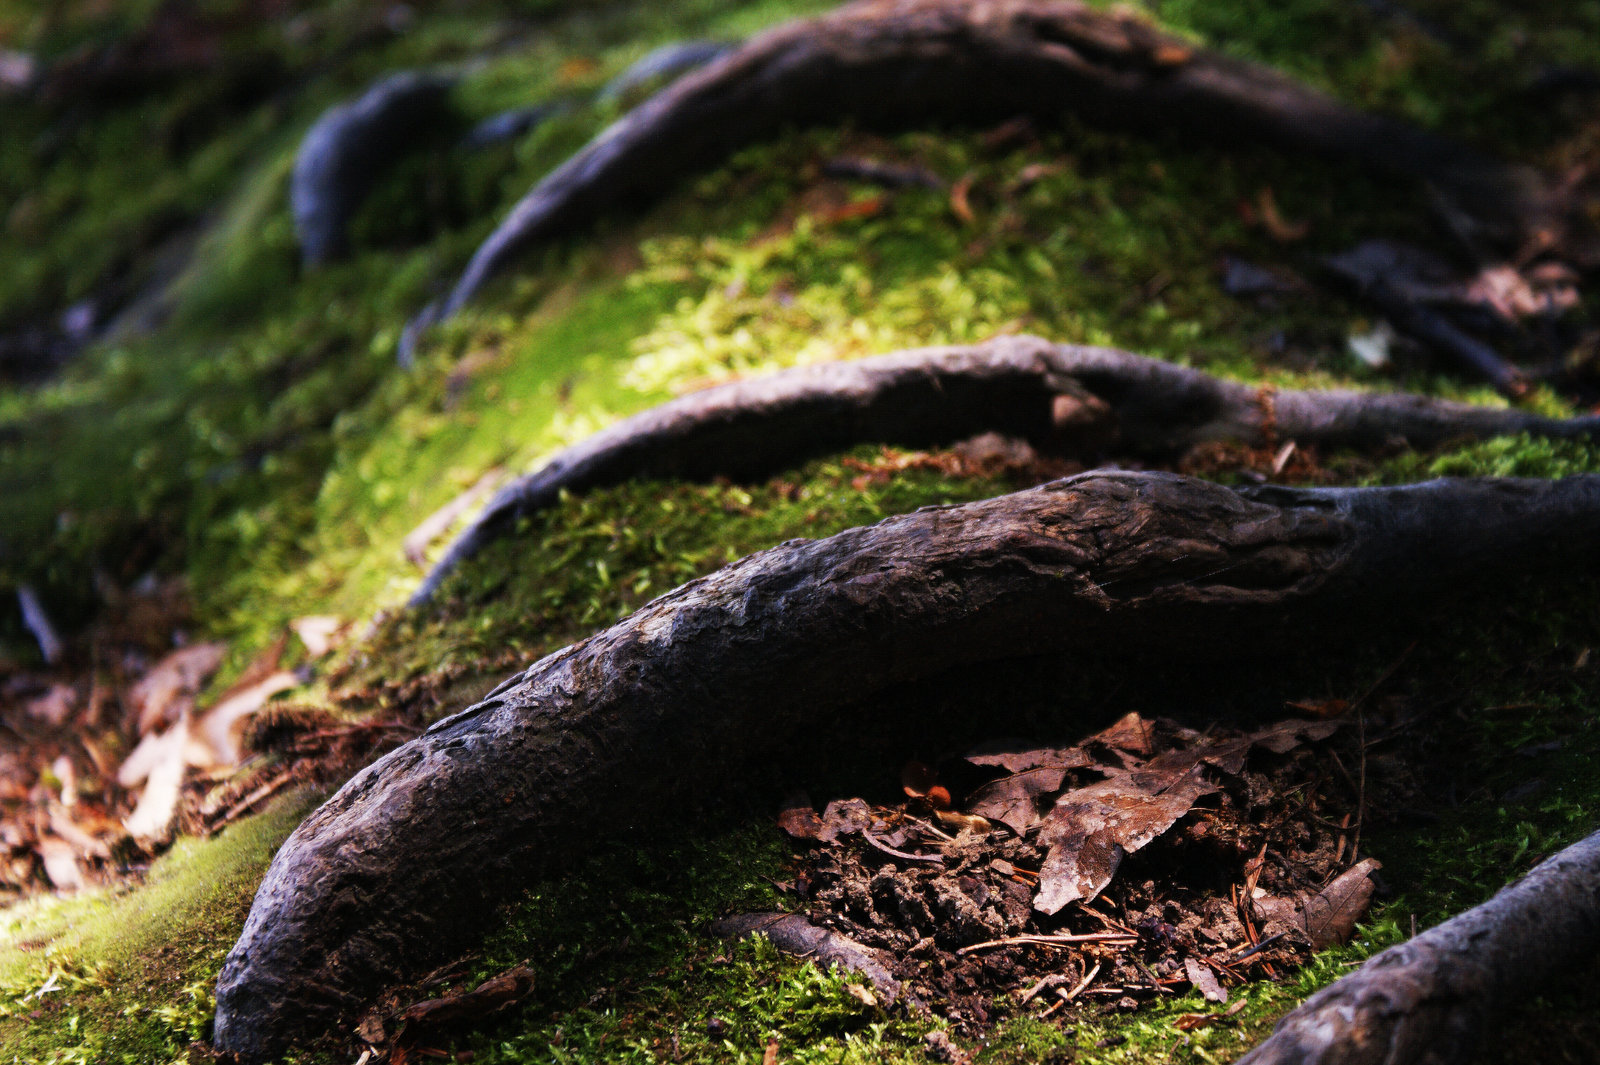 tree_roots_by_evil_iq-d3i3o2c.jpg